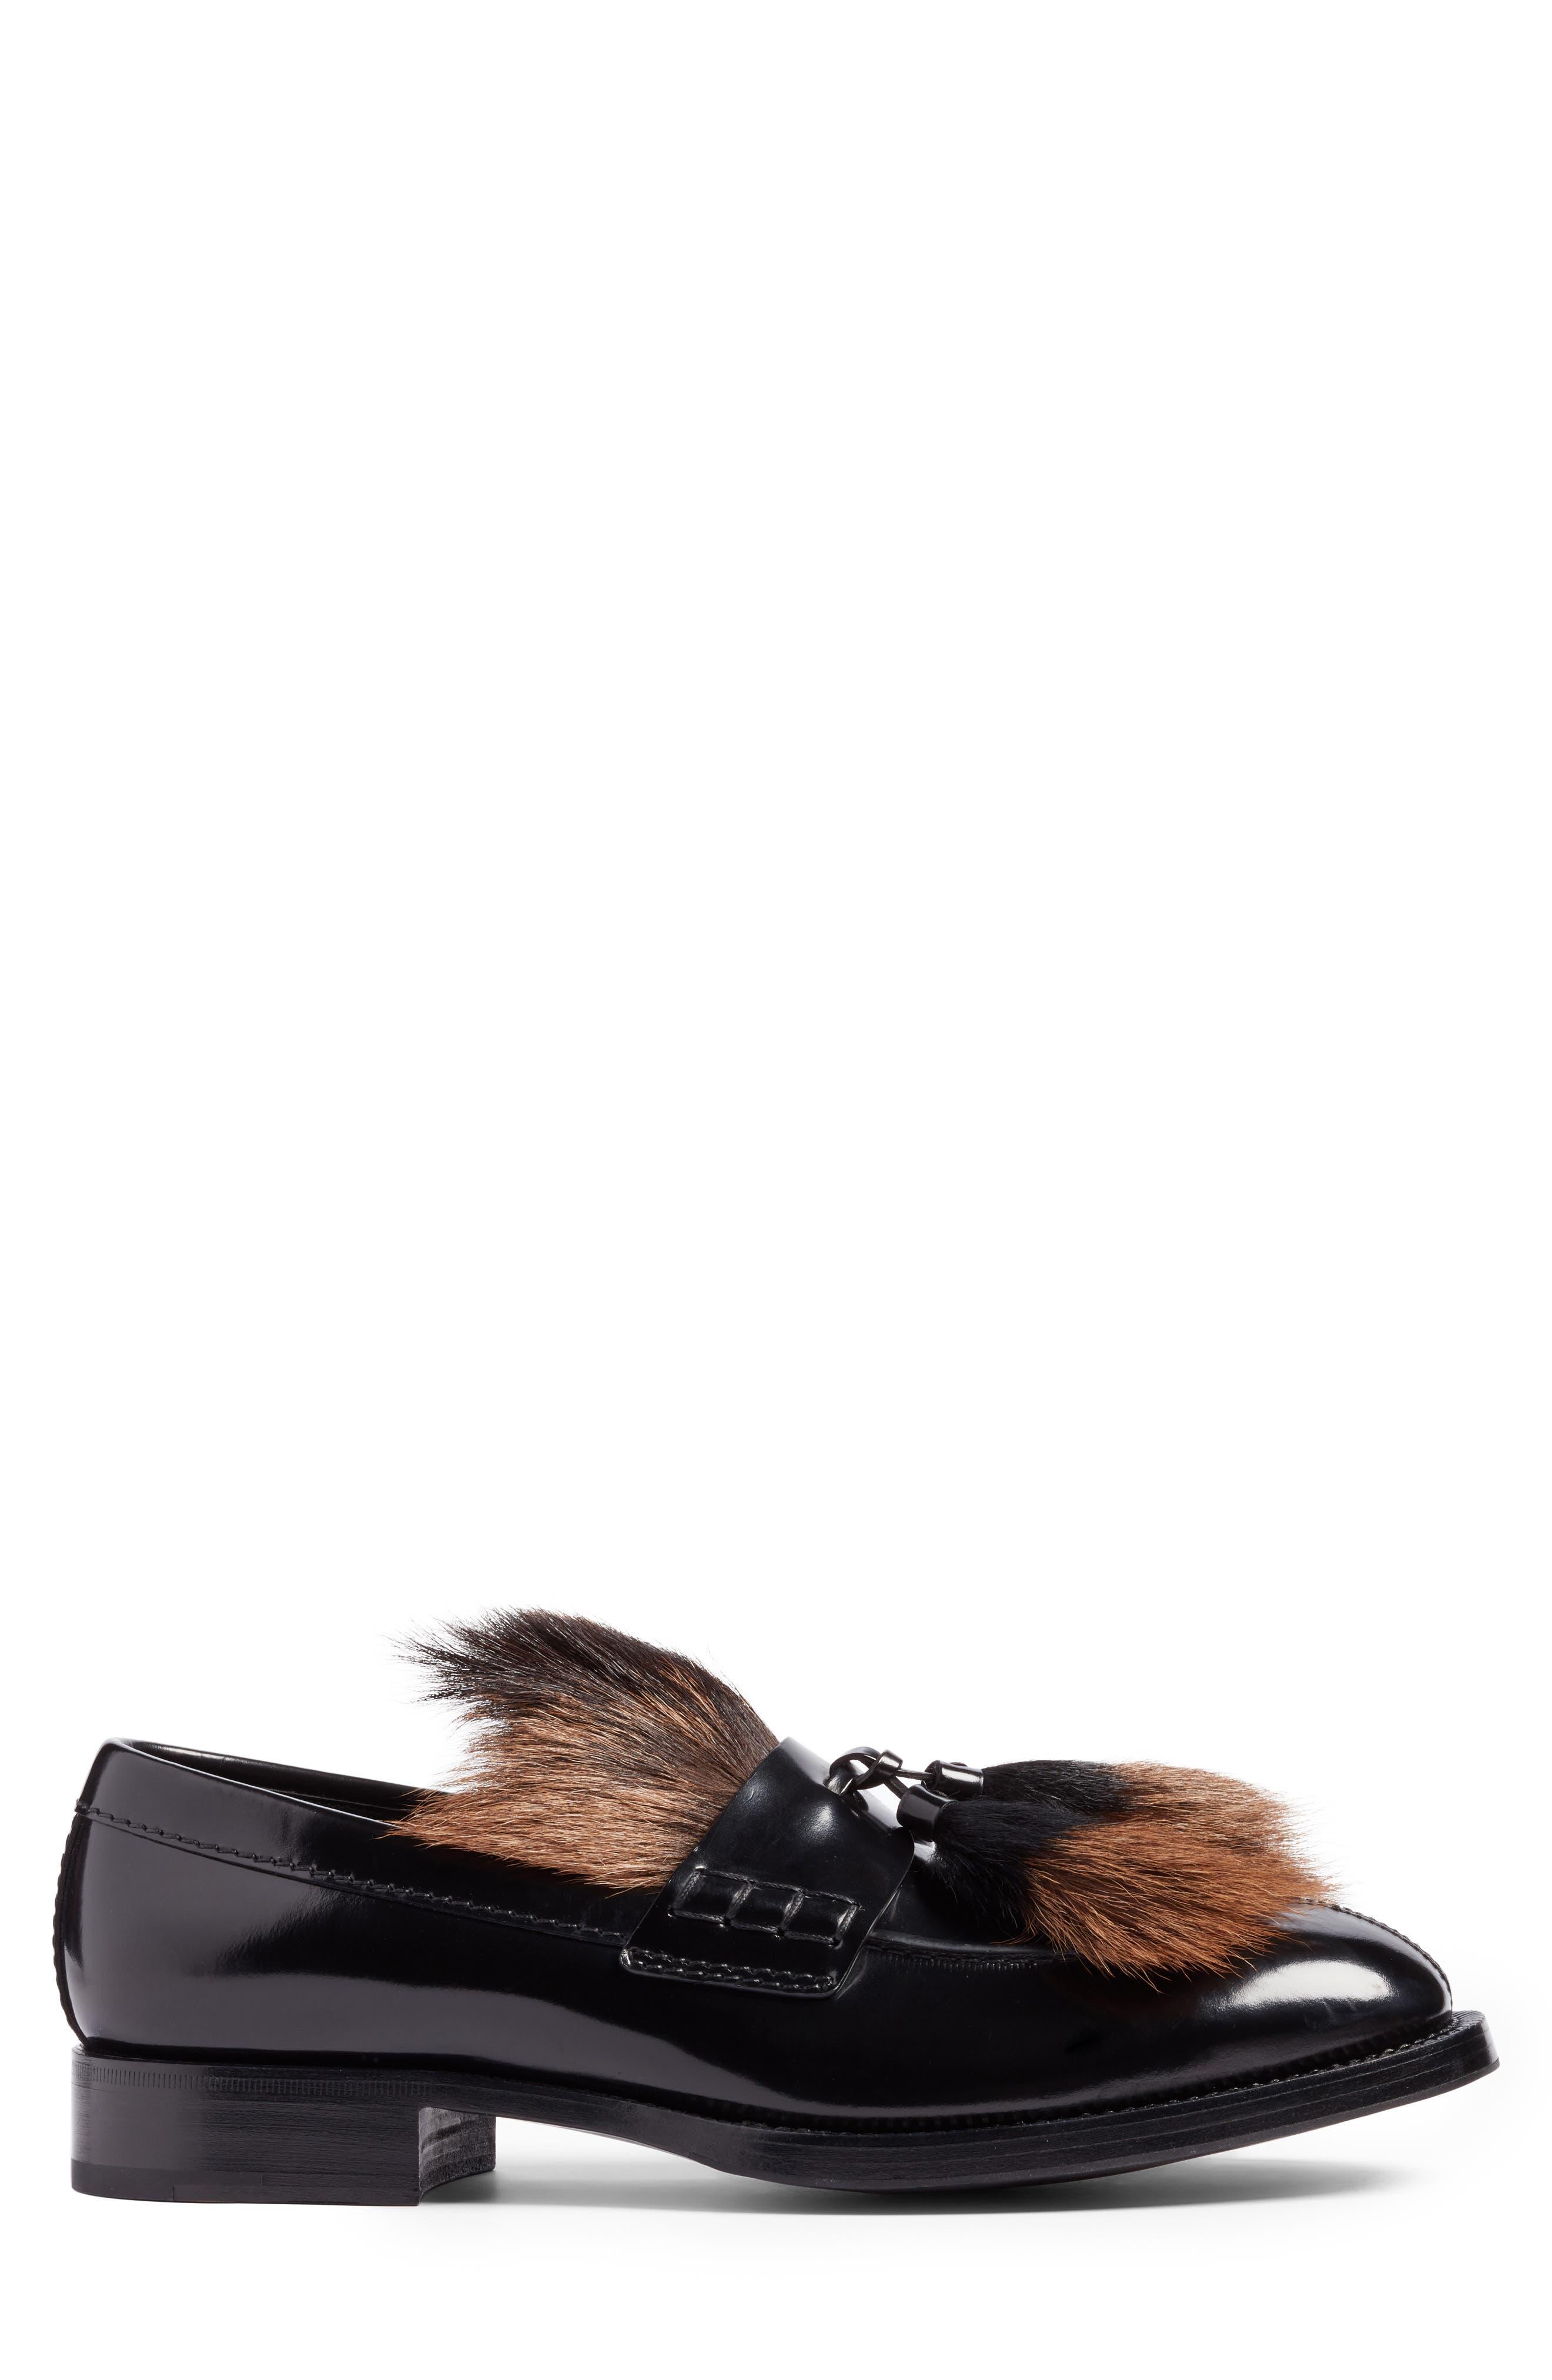 Tassel Loafer with Genuine Goat Hair Trim,                             Alternate thumbnail 3, color,                             001